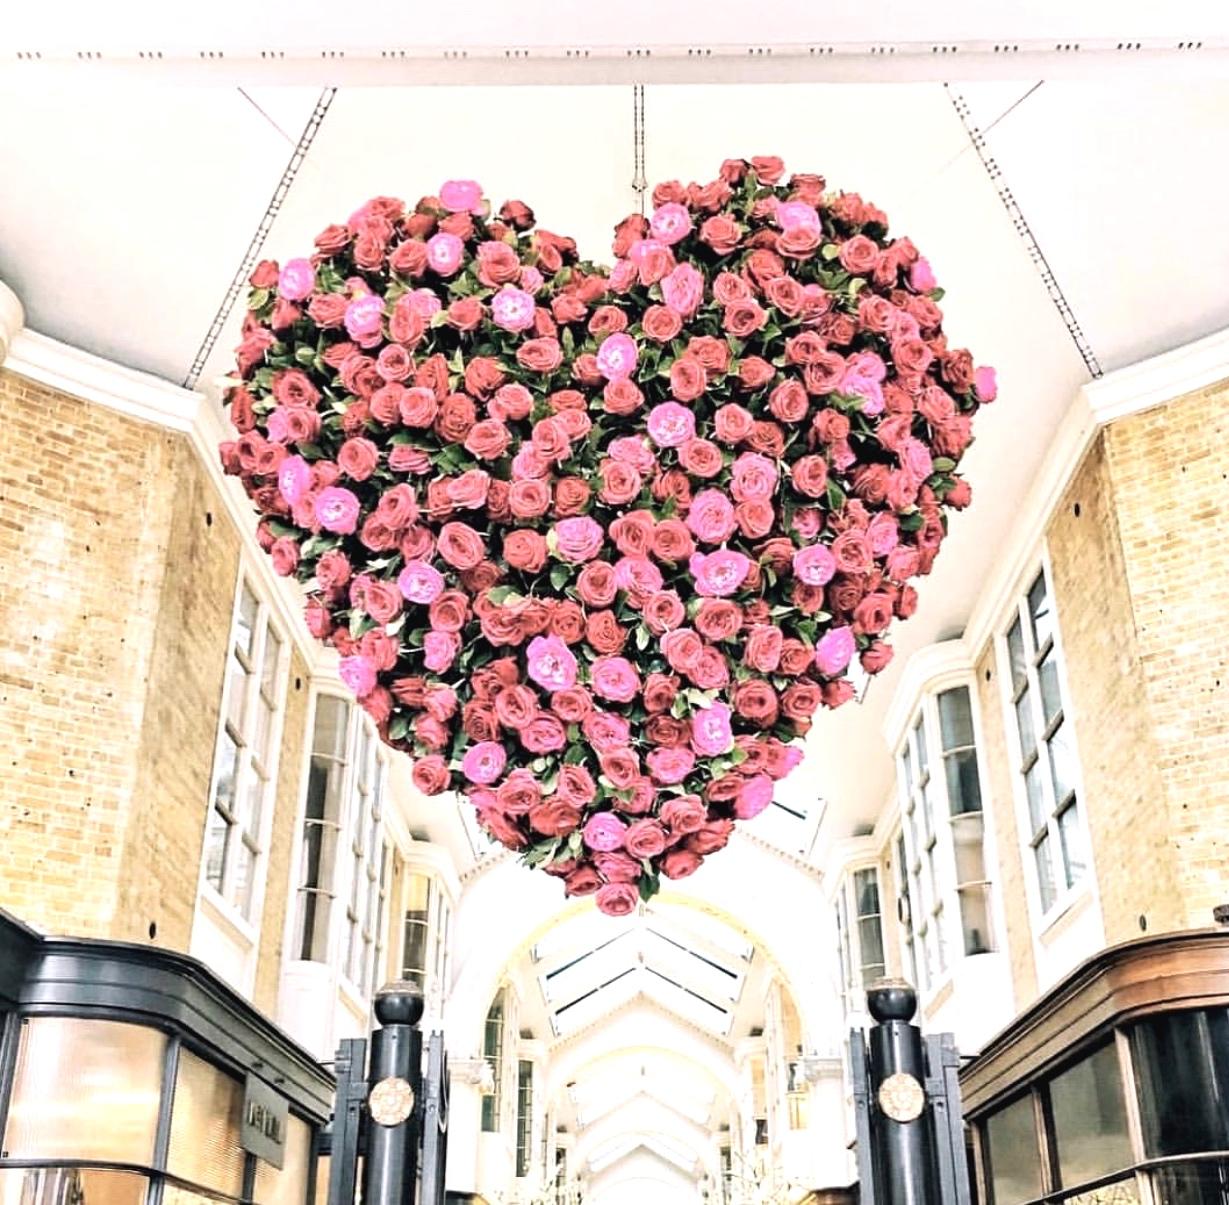 Rose+Heart+in+London+Arcade.jpg